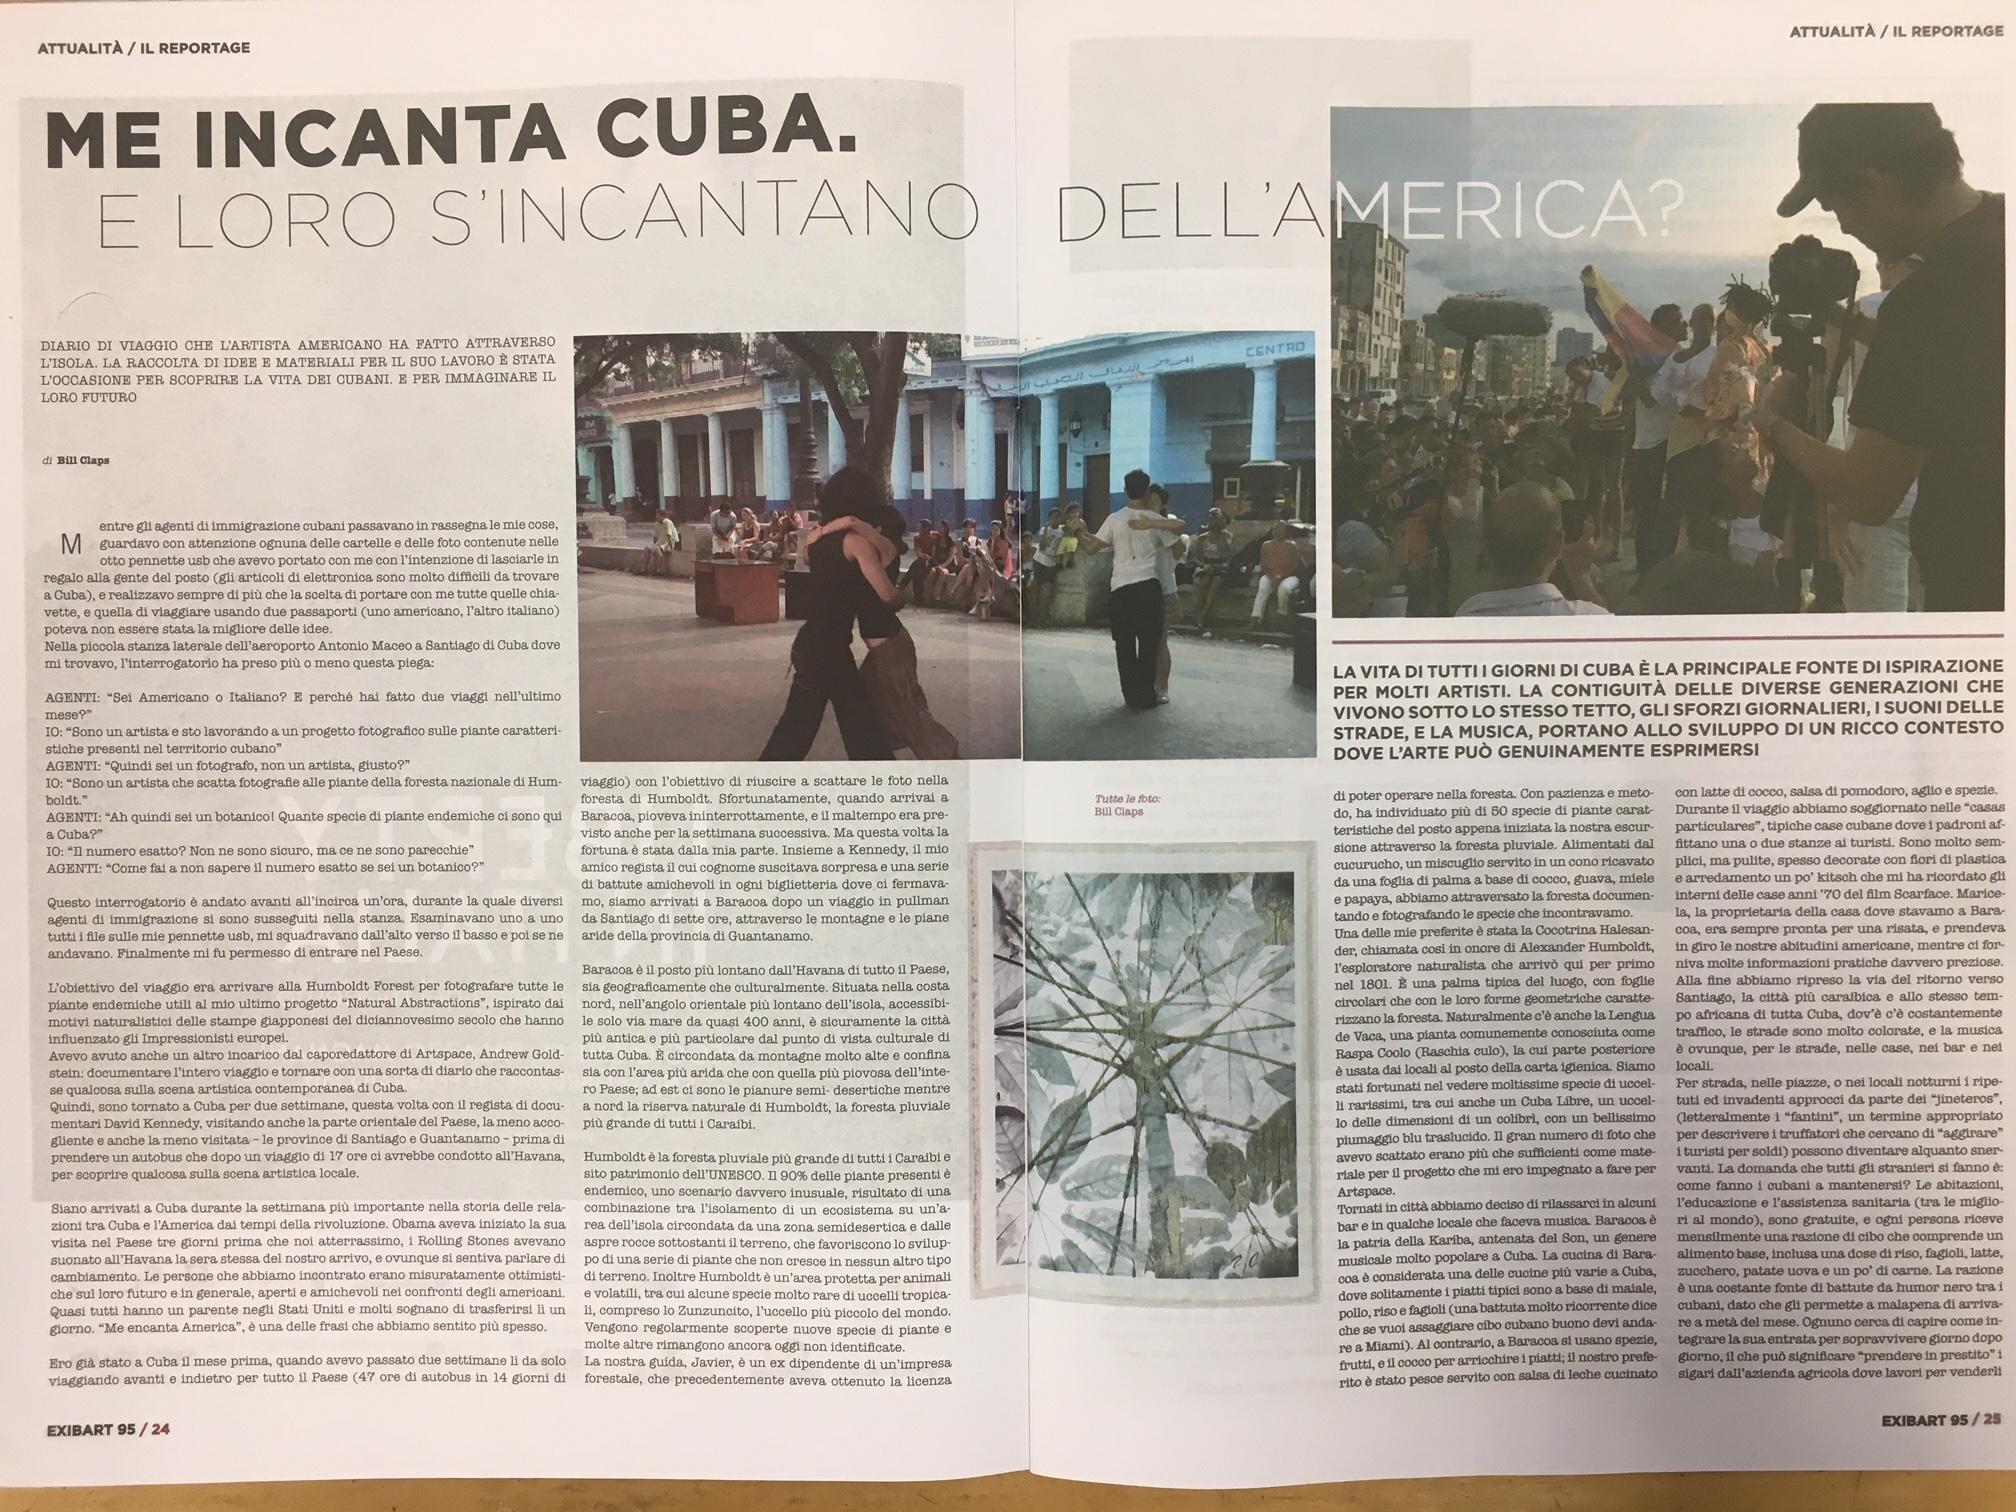 Cuba_Articlo_Claps_Exibart.JPG